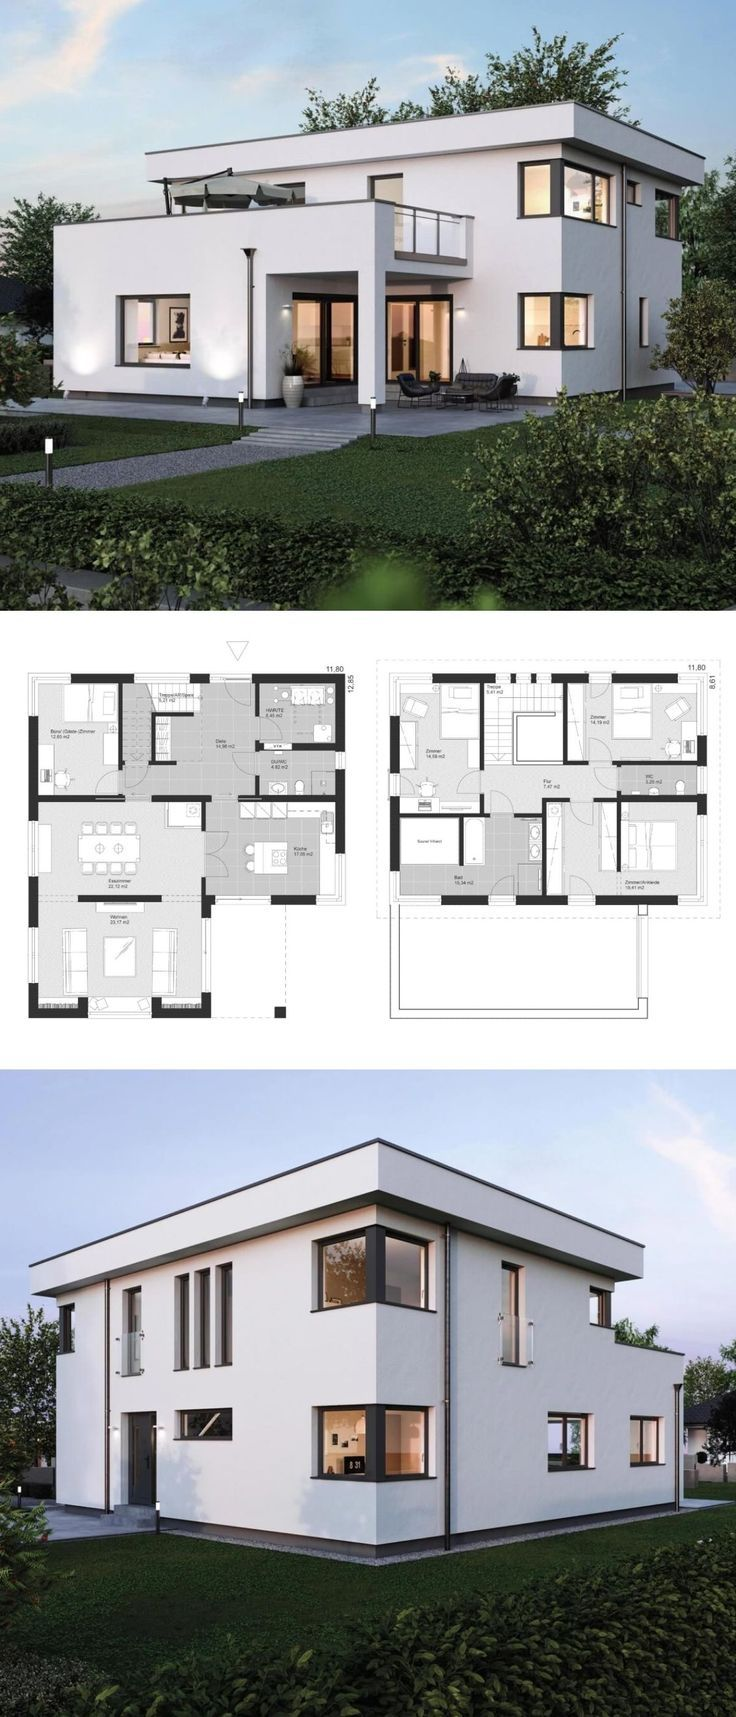 Modern City Villa Floor Plan With Flat Roof Bauhaus Style Architecture Annex Architecture House Flat Roof House Architecture